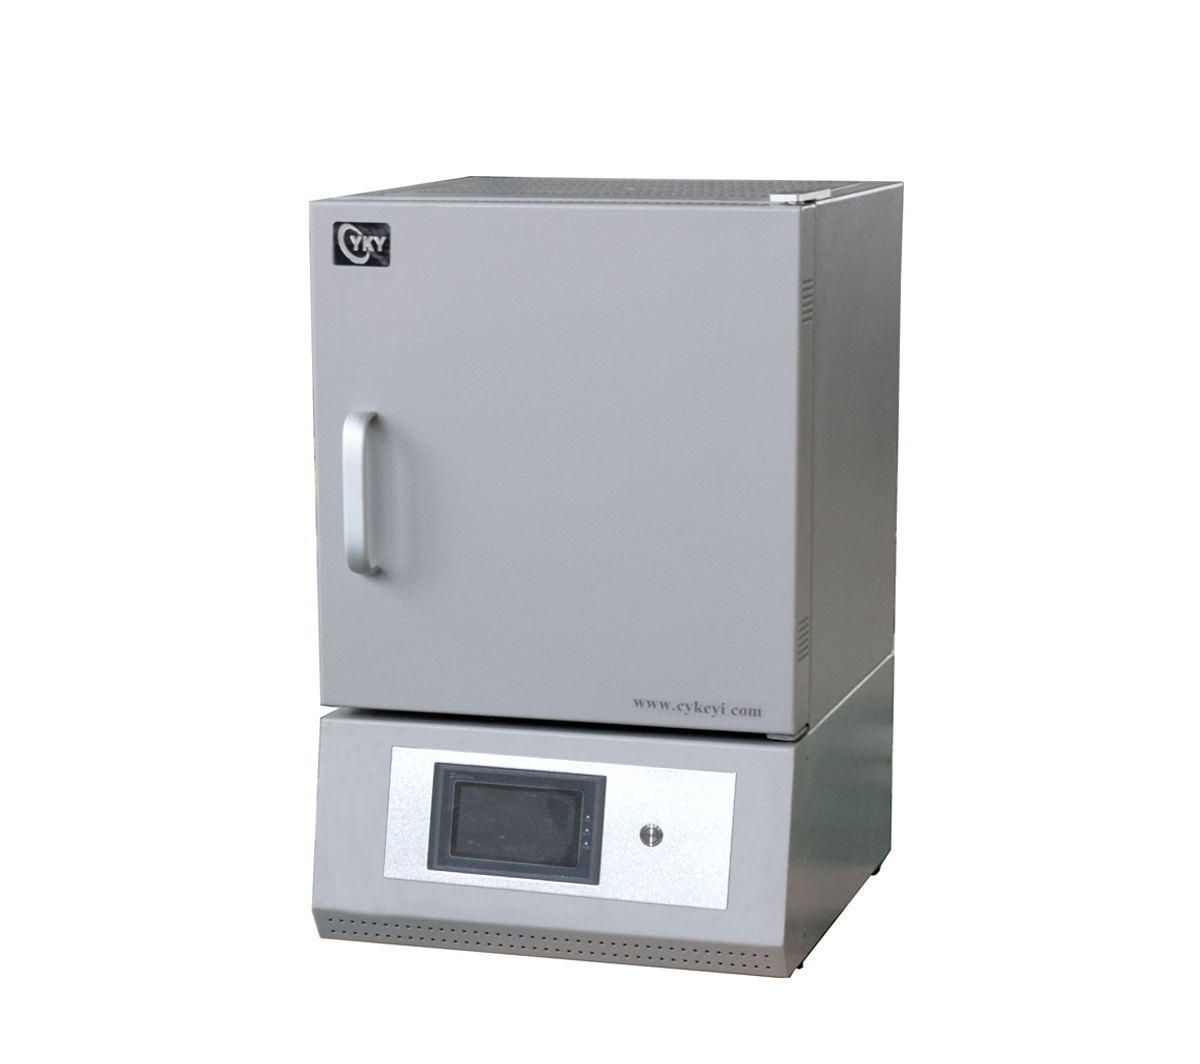 Laboratory 1200℃ Heat Treatment Box furnace with 120*120*130mm Chamber CY-M1200-2L